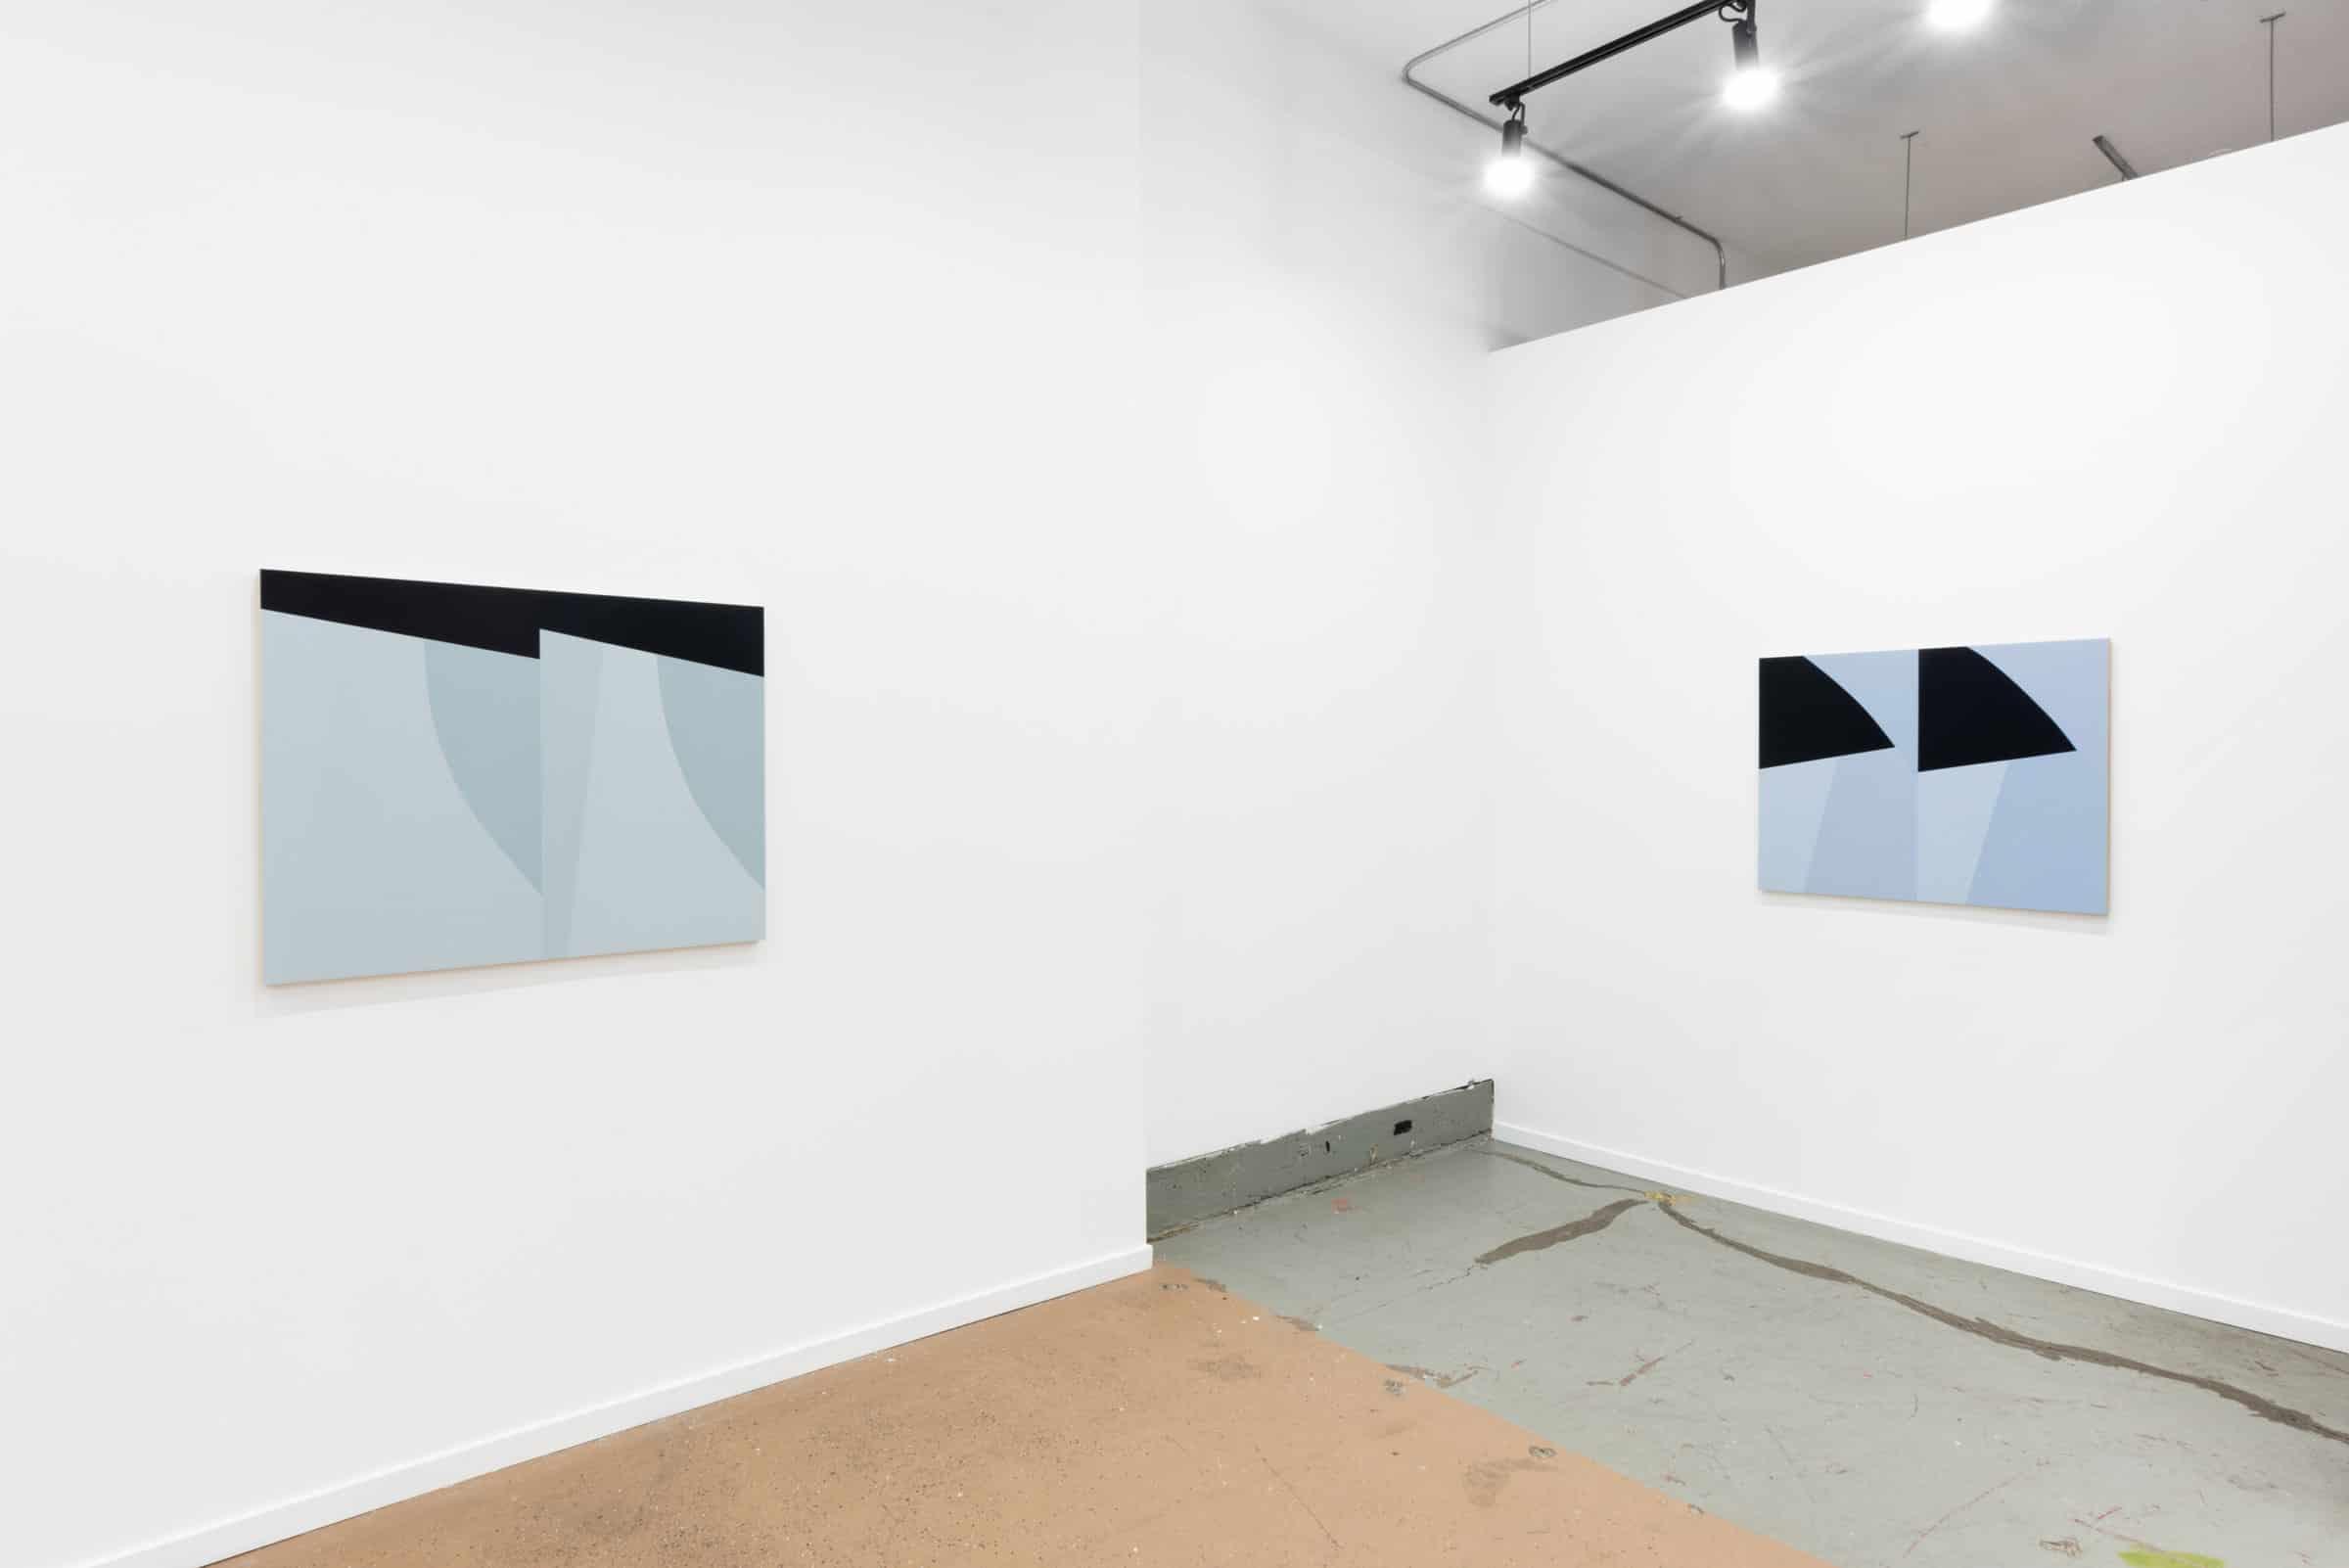 Larissa Tiggelers double bodied viewing room art exhibit